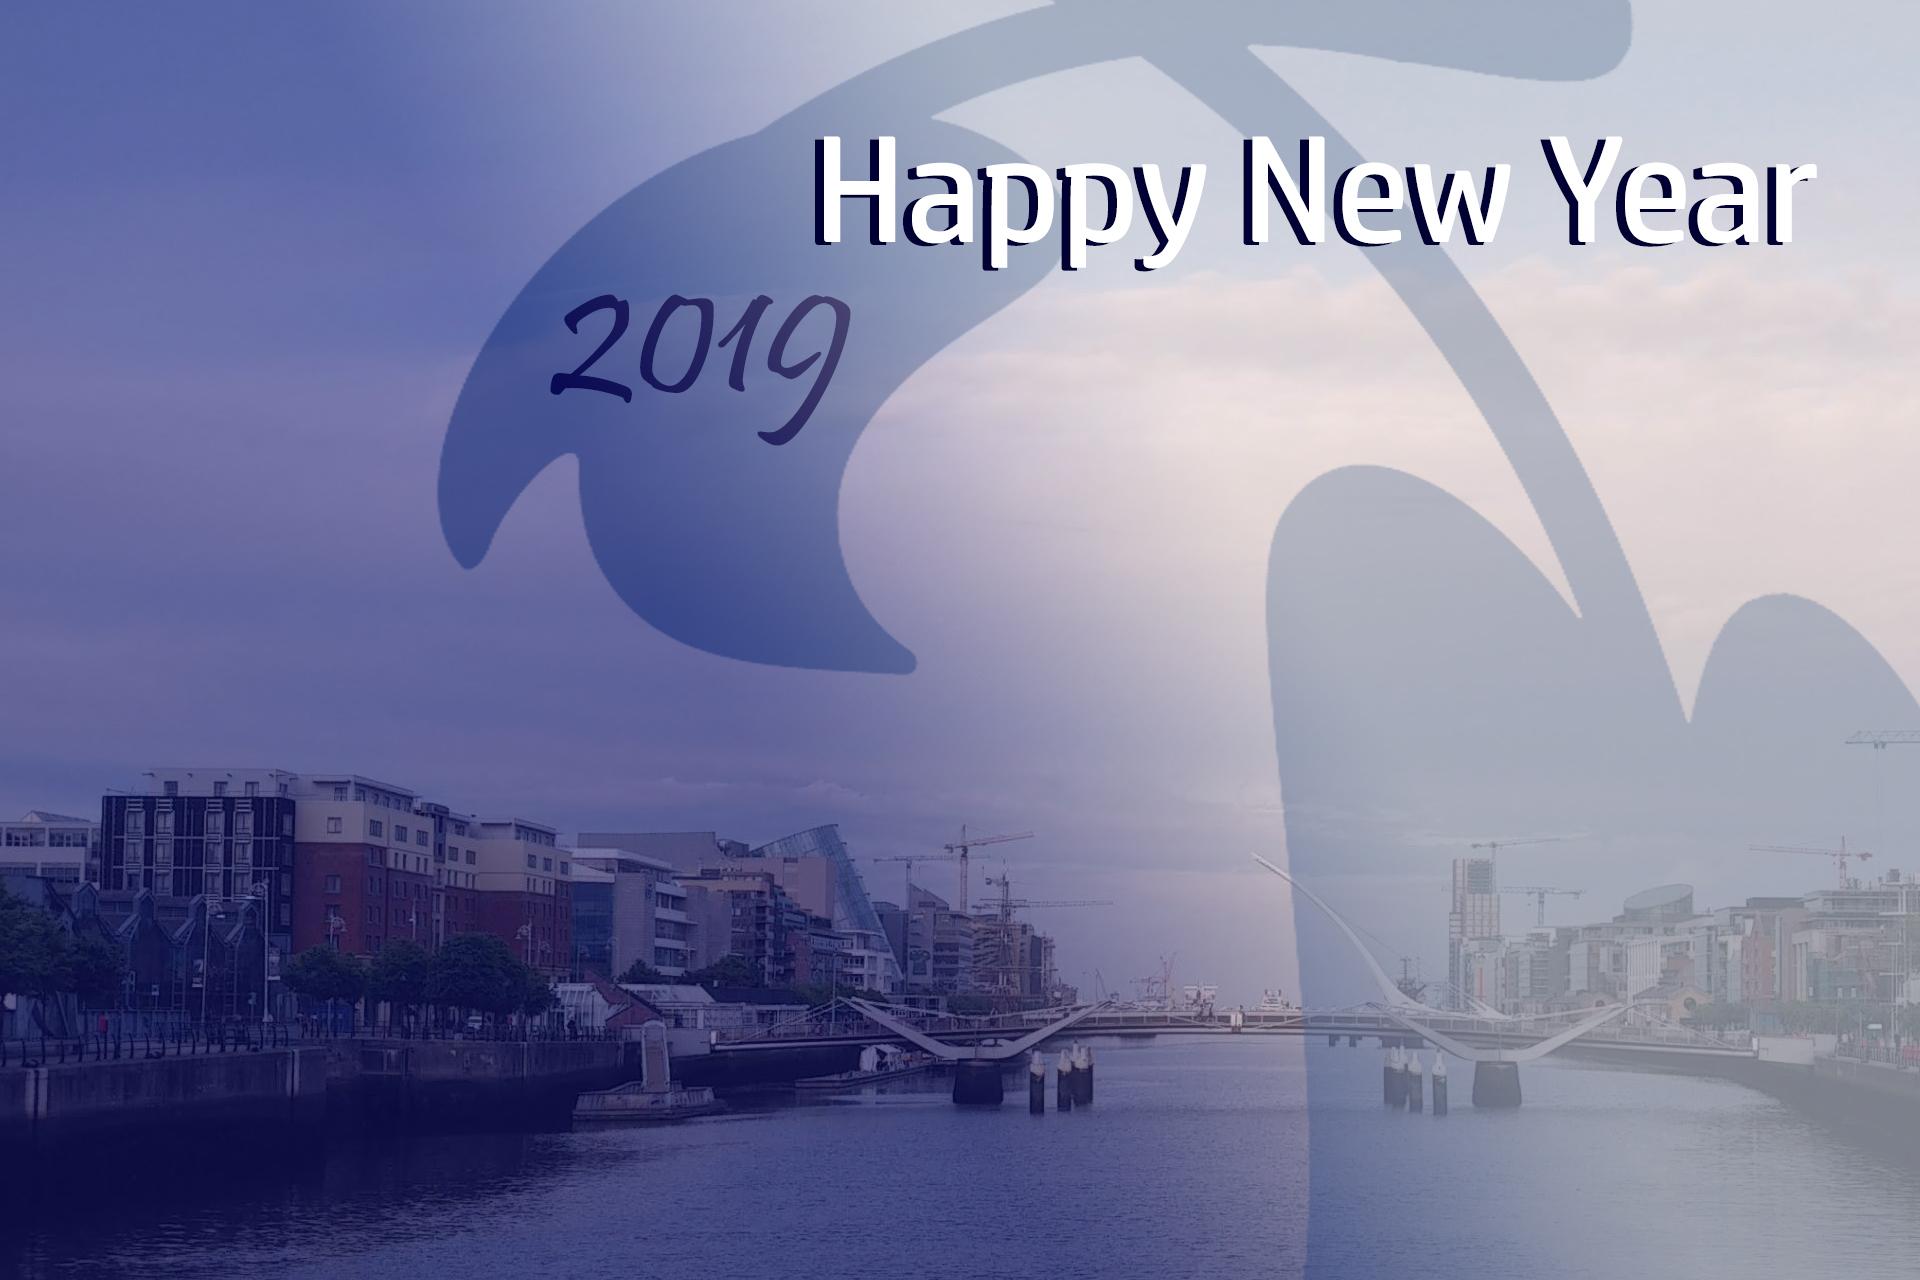 Happy-new-years-2019_by_Philemonday.jpg